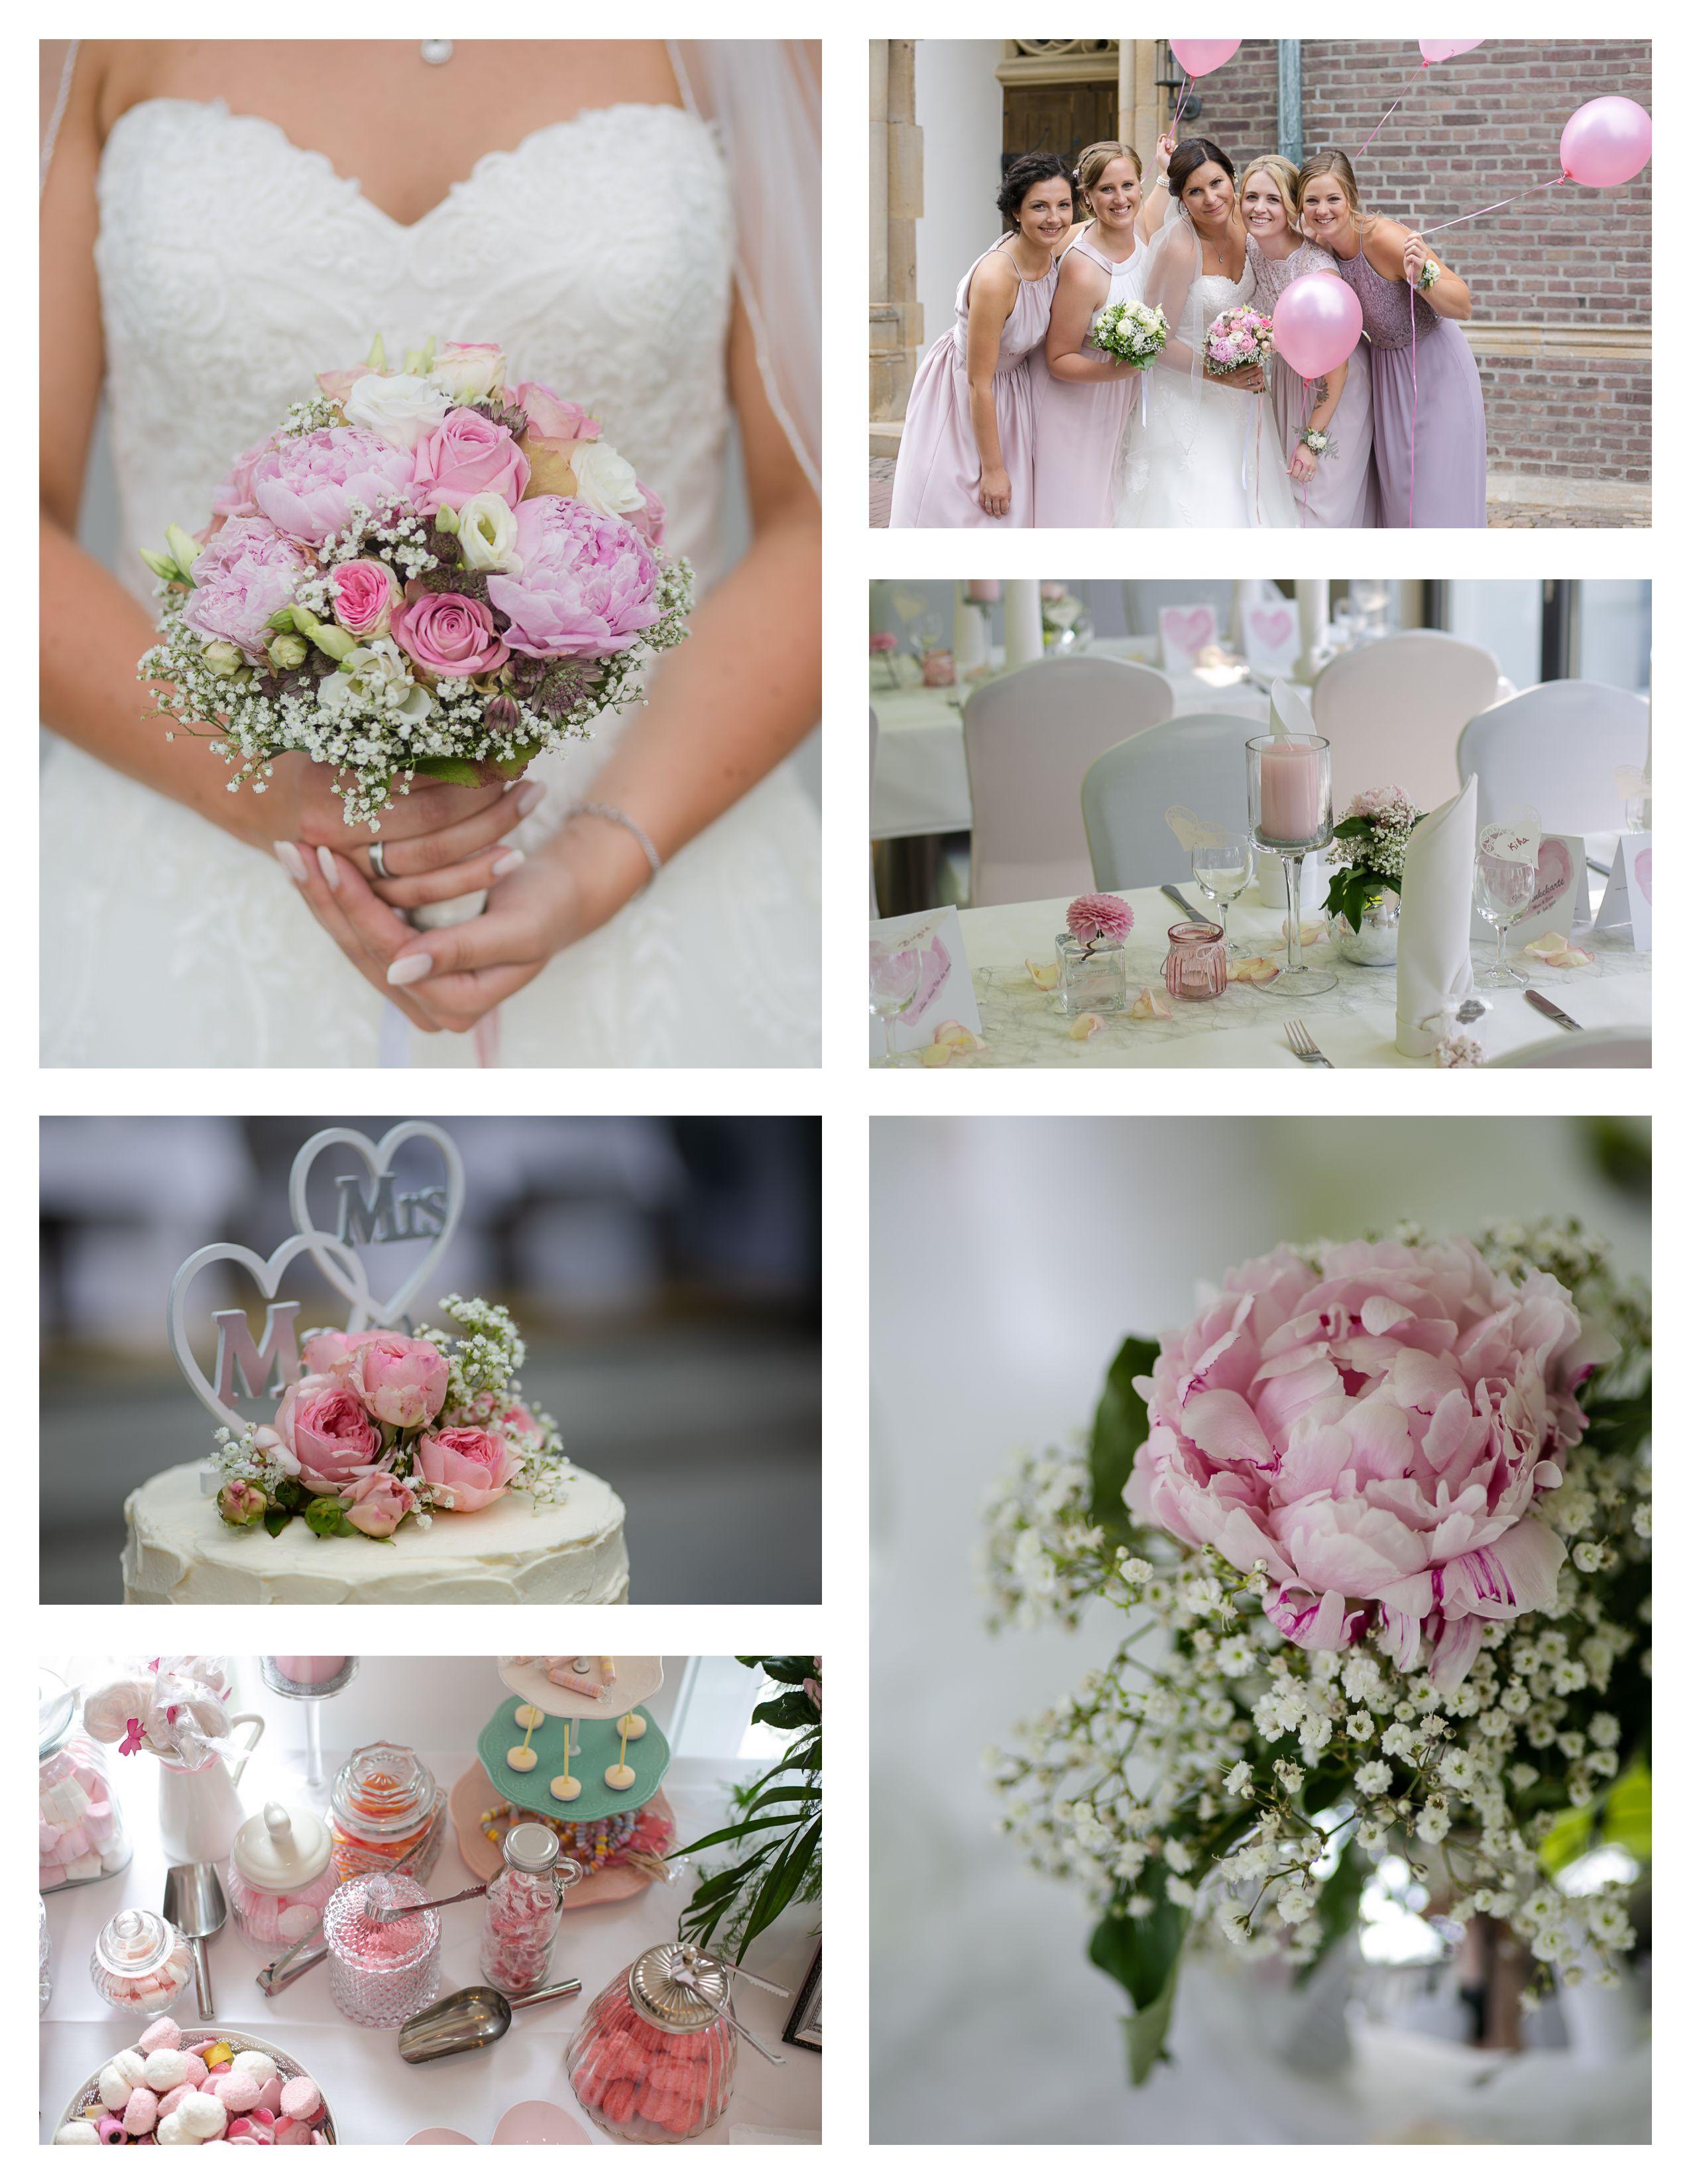 Hochzeit Farbkonzept Rosa Sommer Natur Altrosa In 2020 Hochzeit Hochzeitskleid Spitze Hochzeitsfotos